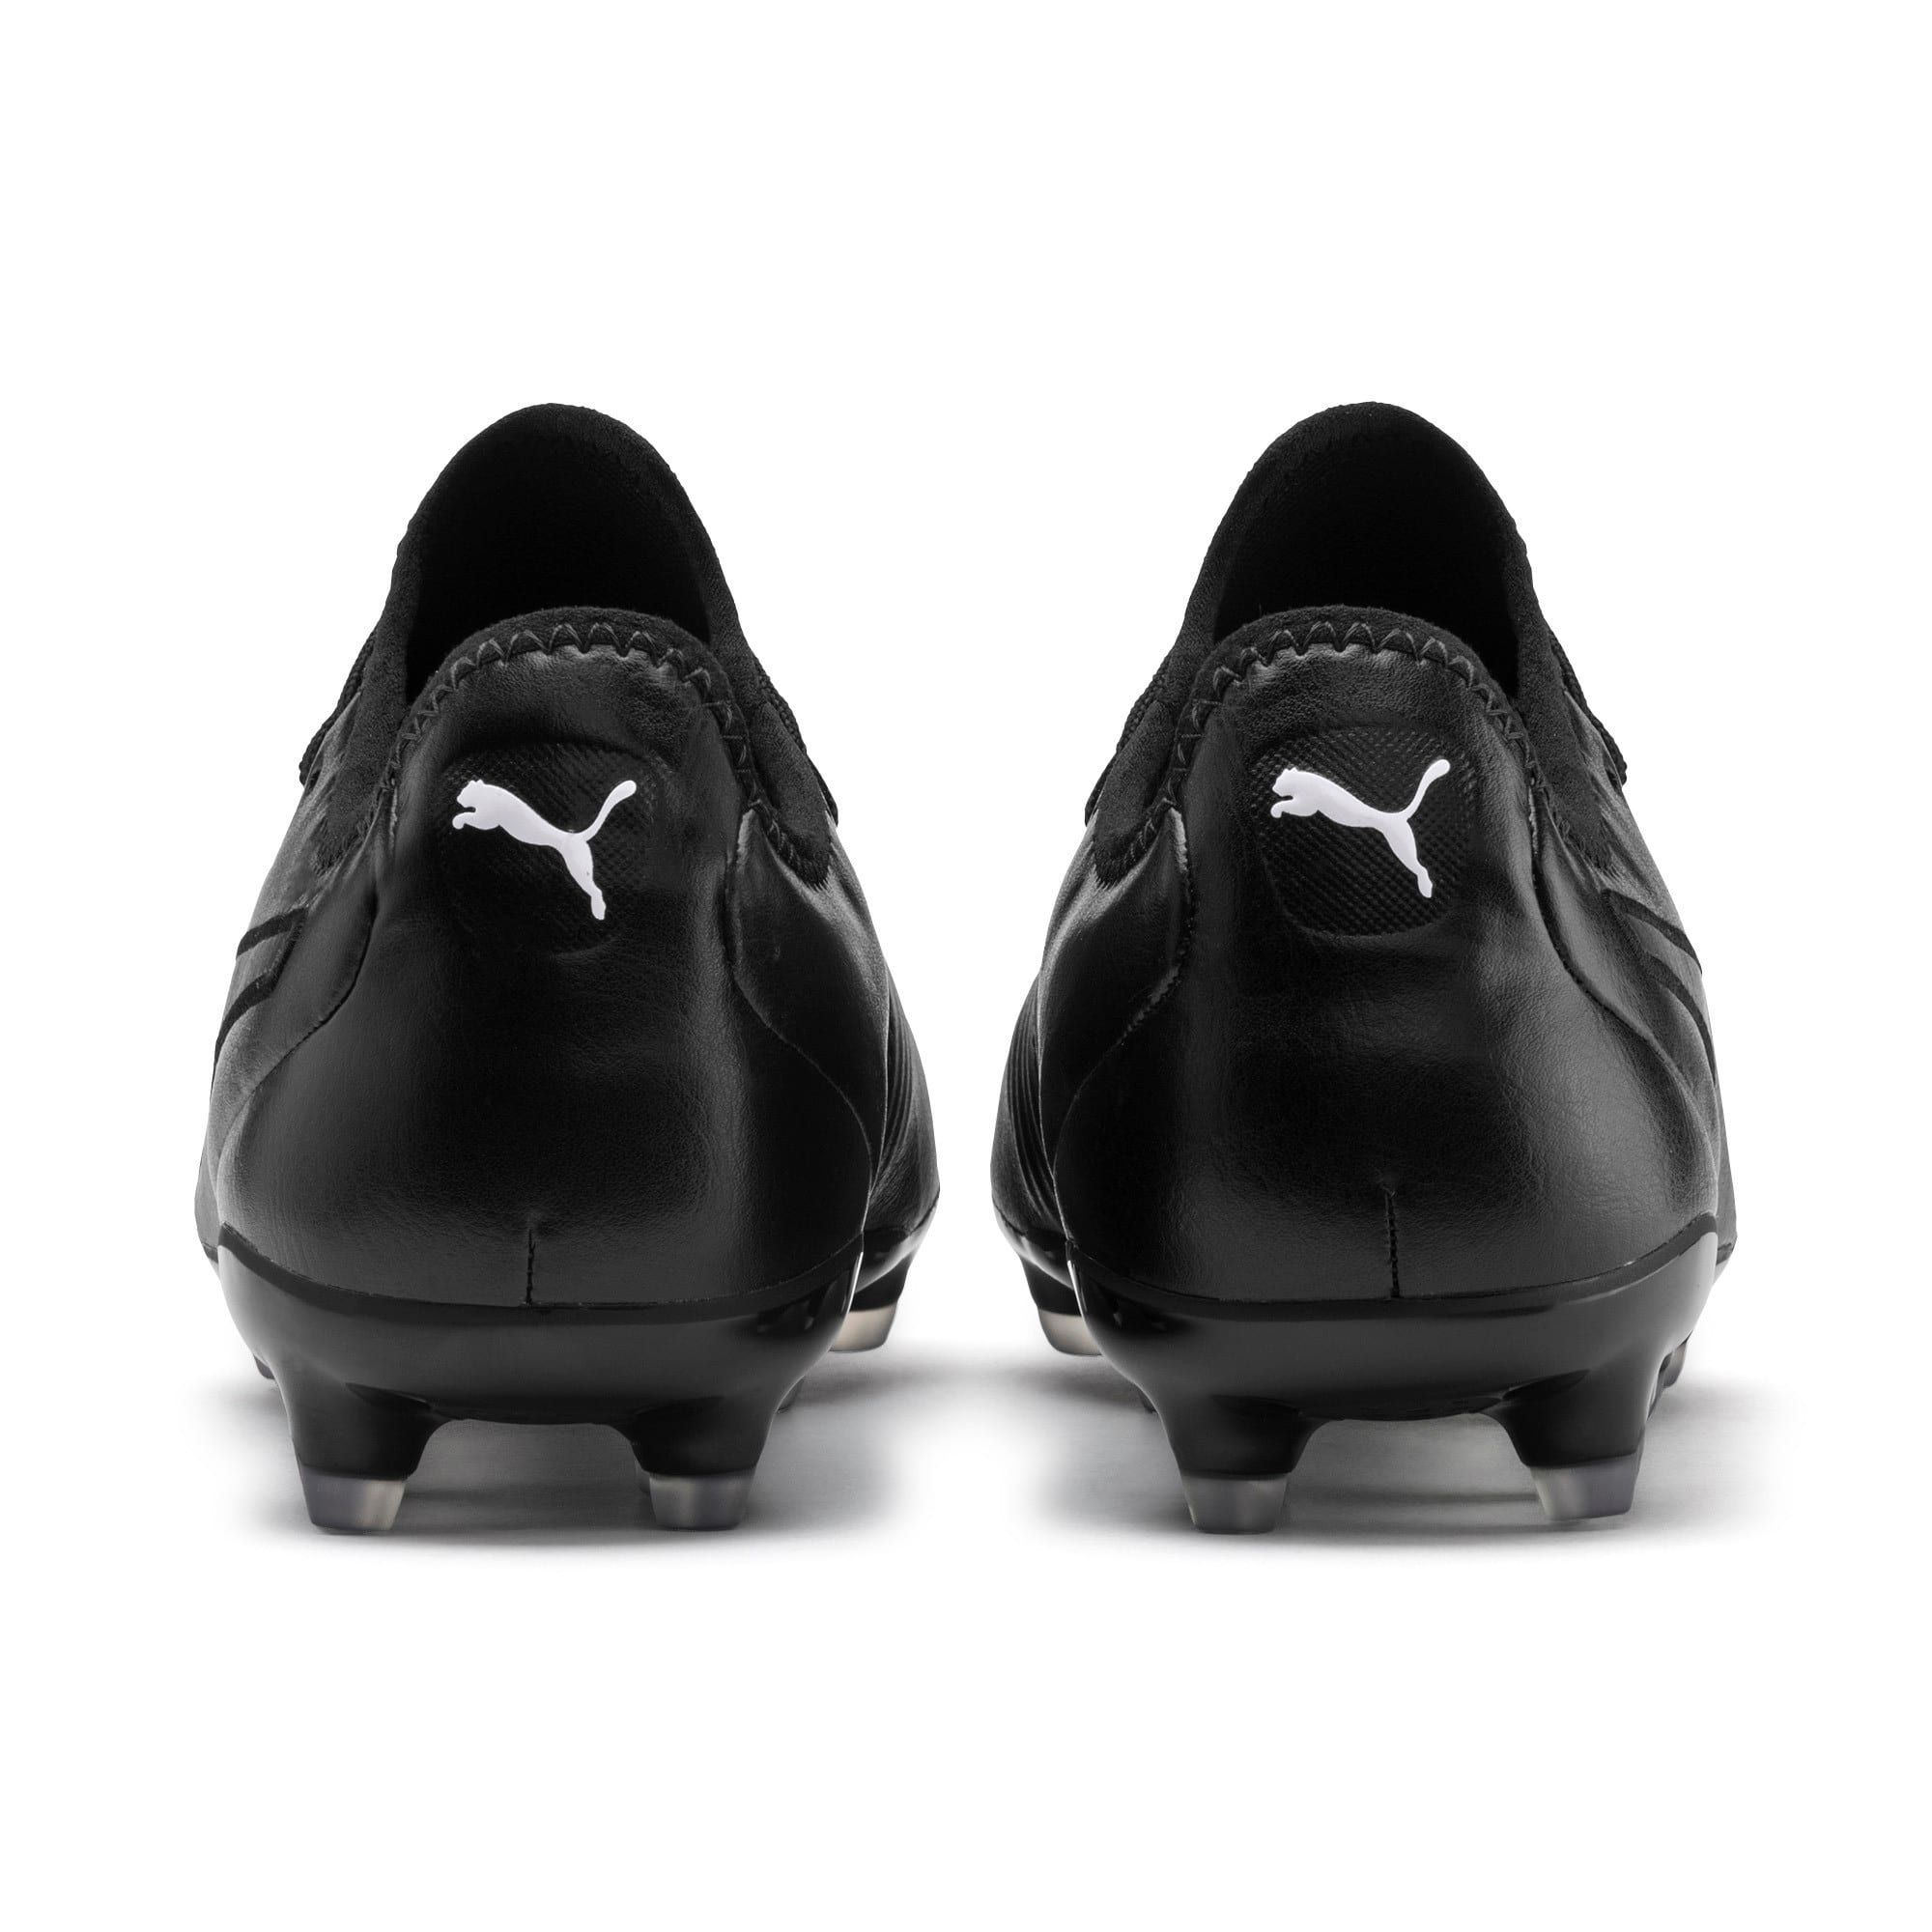 Thumbnail 4 of King Pro FG Soccer Cleats, Puma Black-Puma White, medium